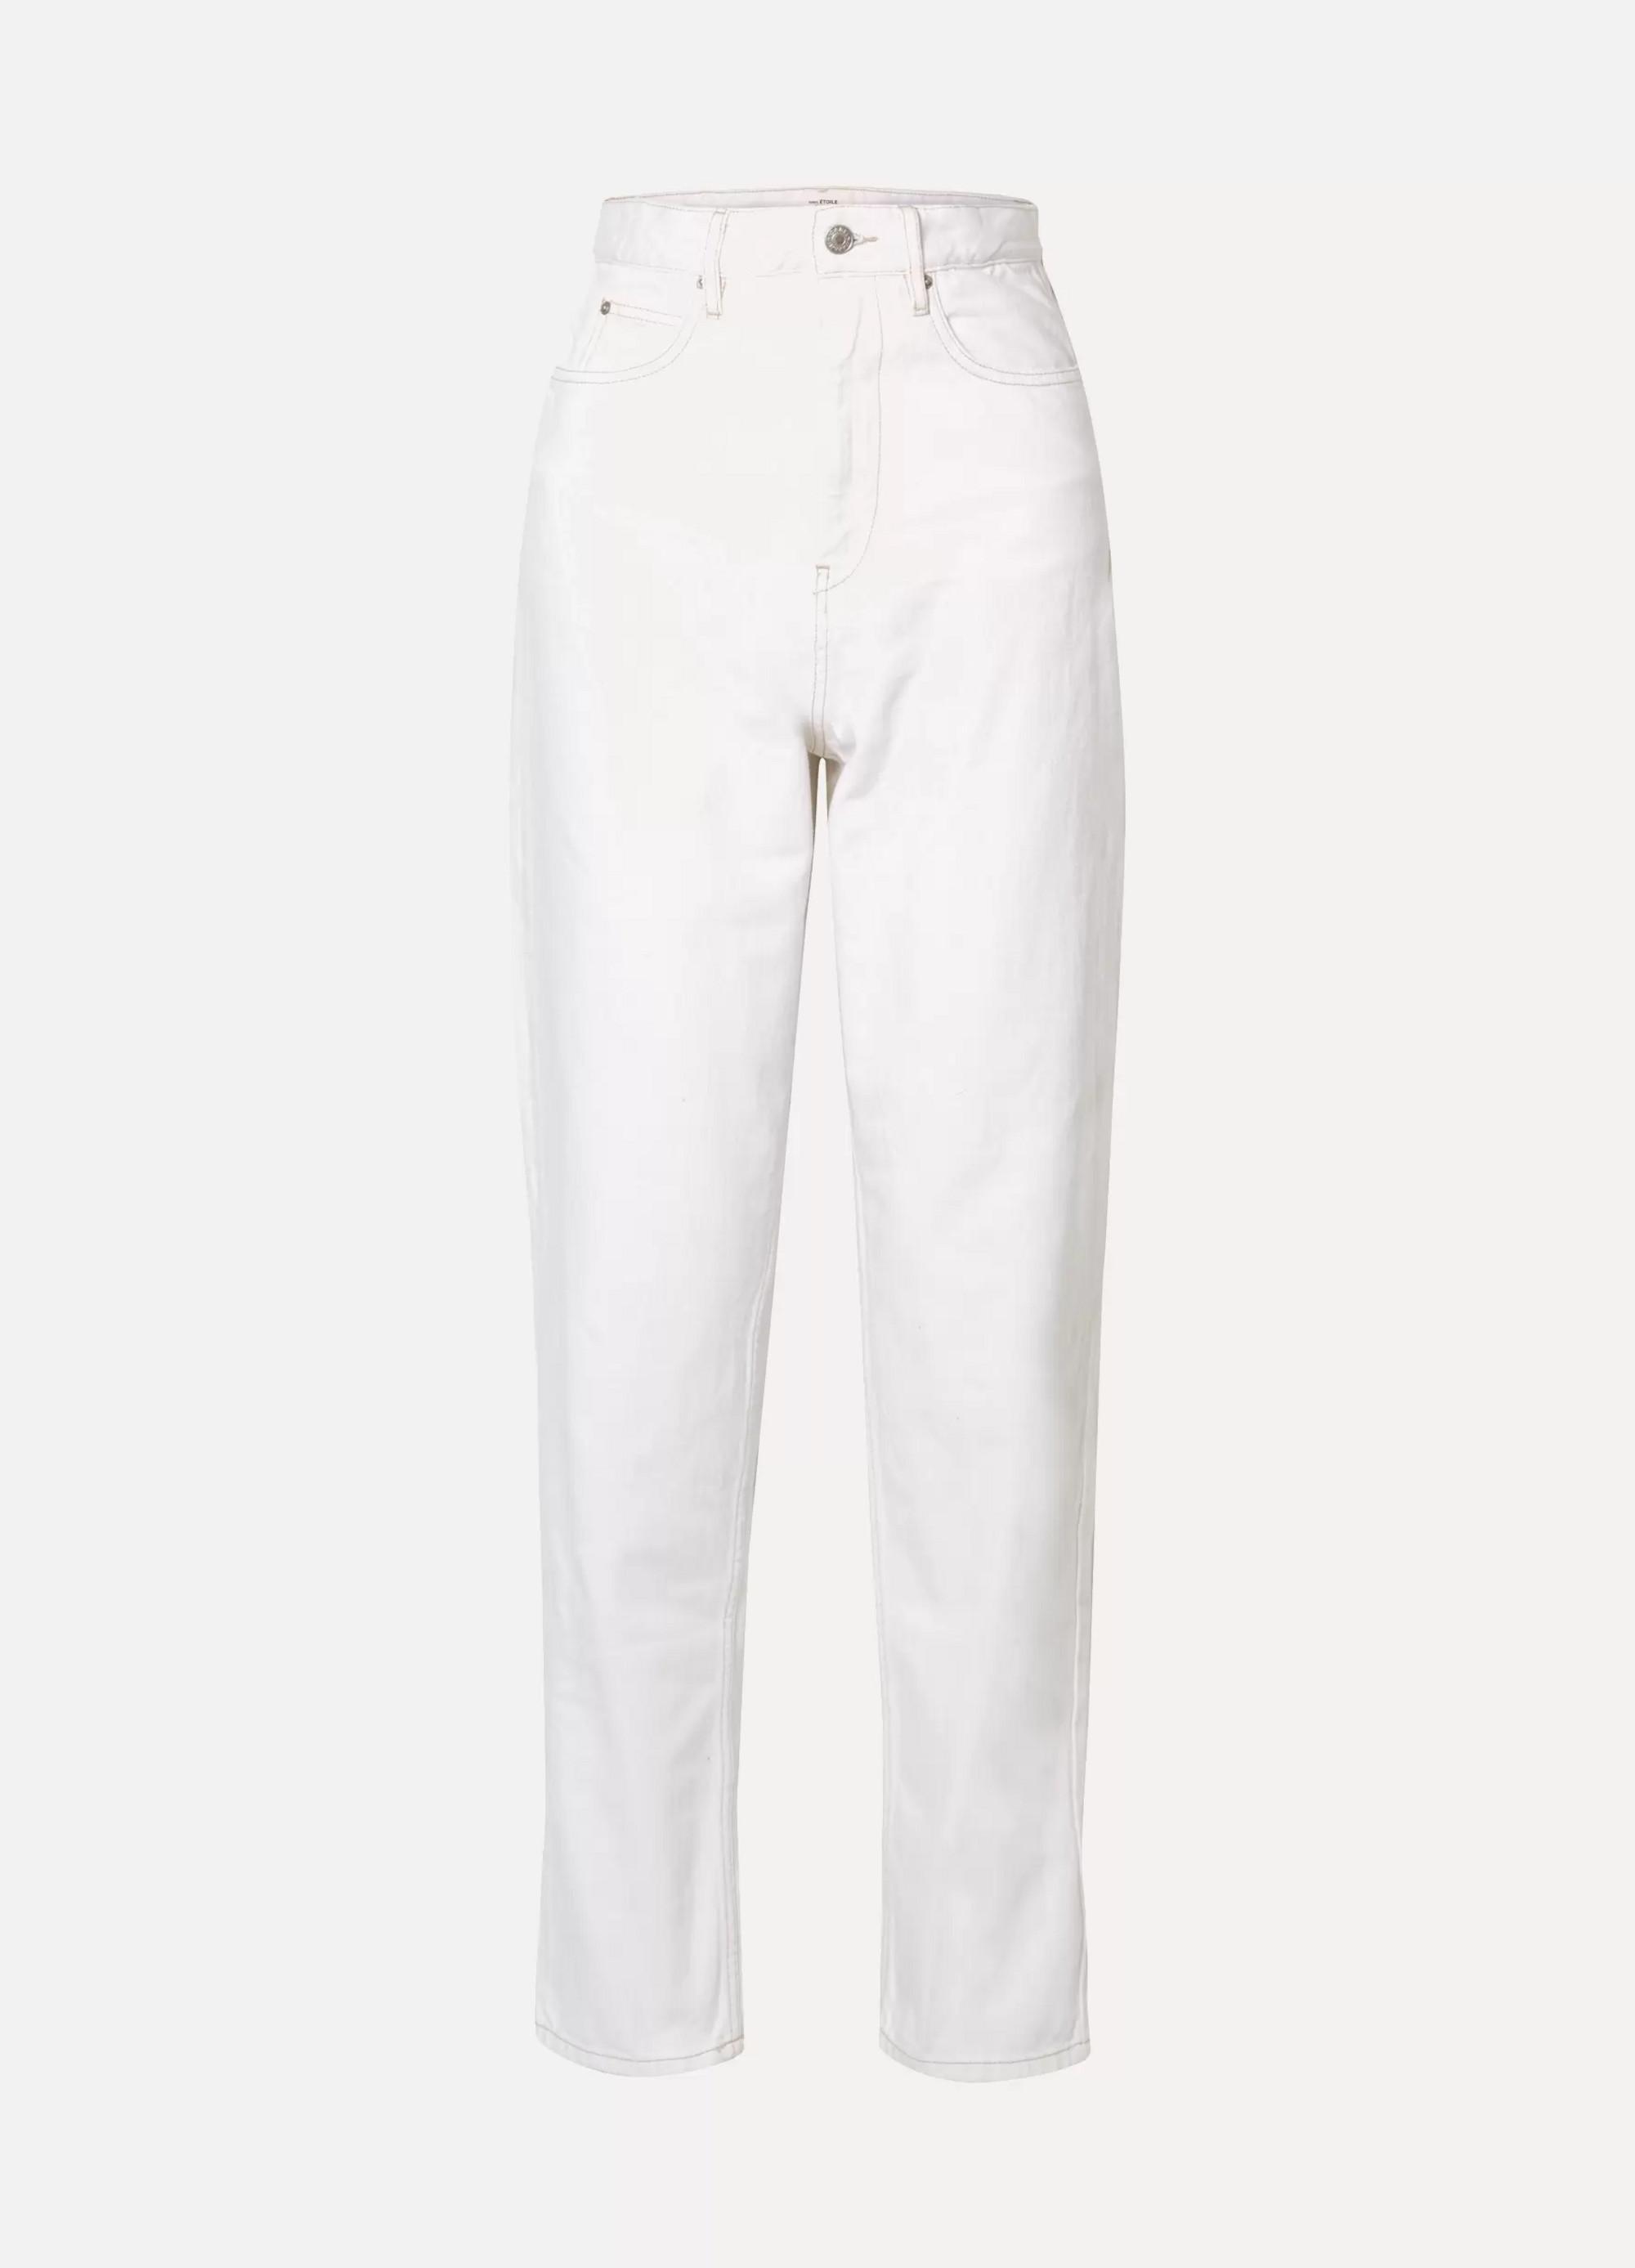 Isabel Marant Corsy high-rise boyfriend jeans